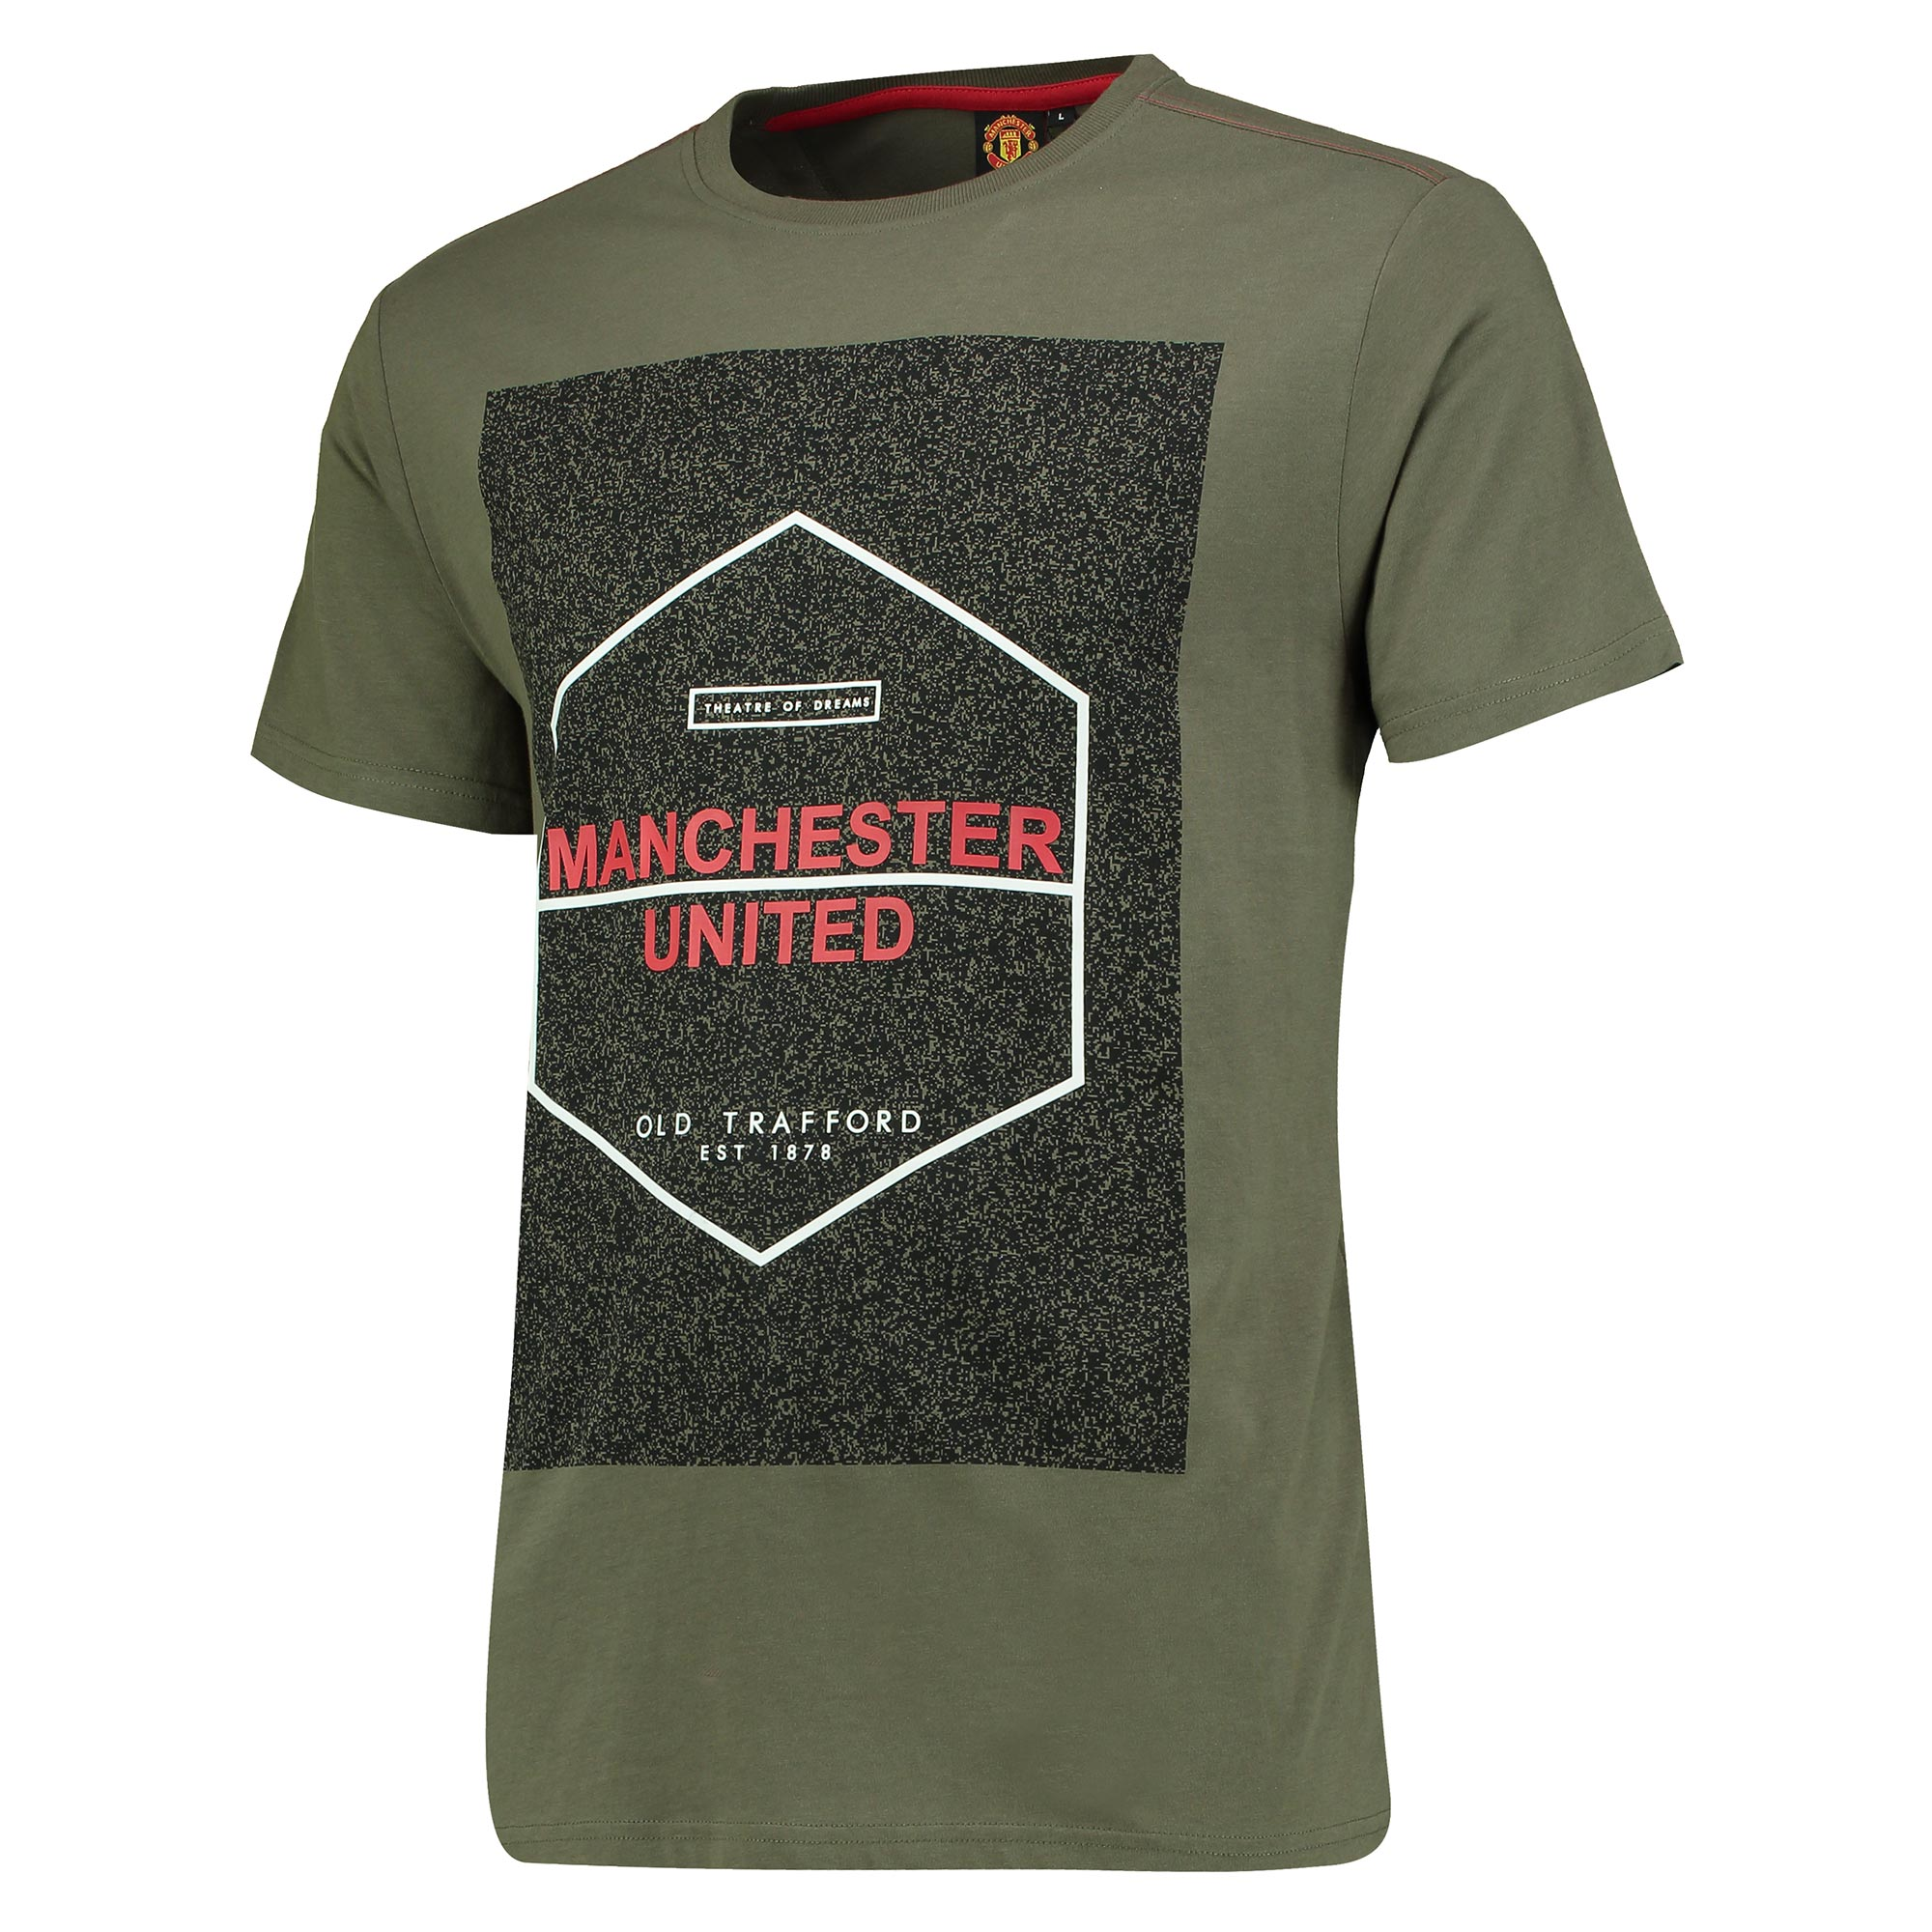 Manchester United Hexagon Graphic T-Shirt - Green Marl - Mens